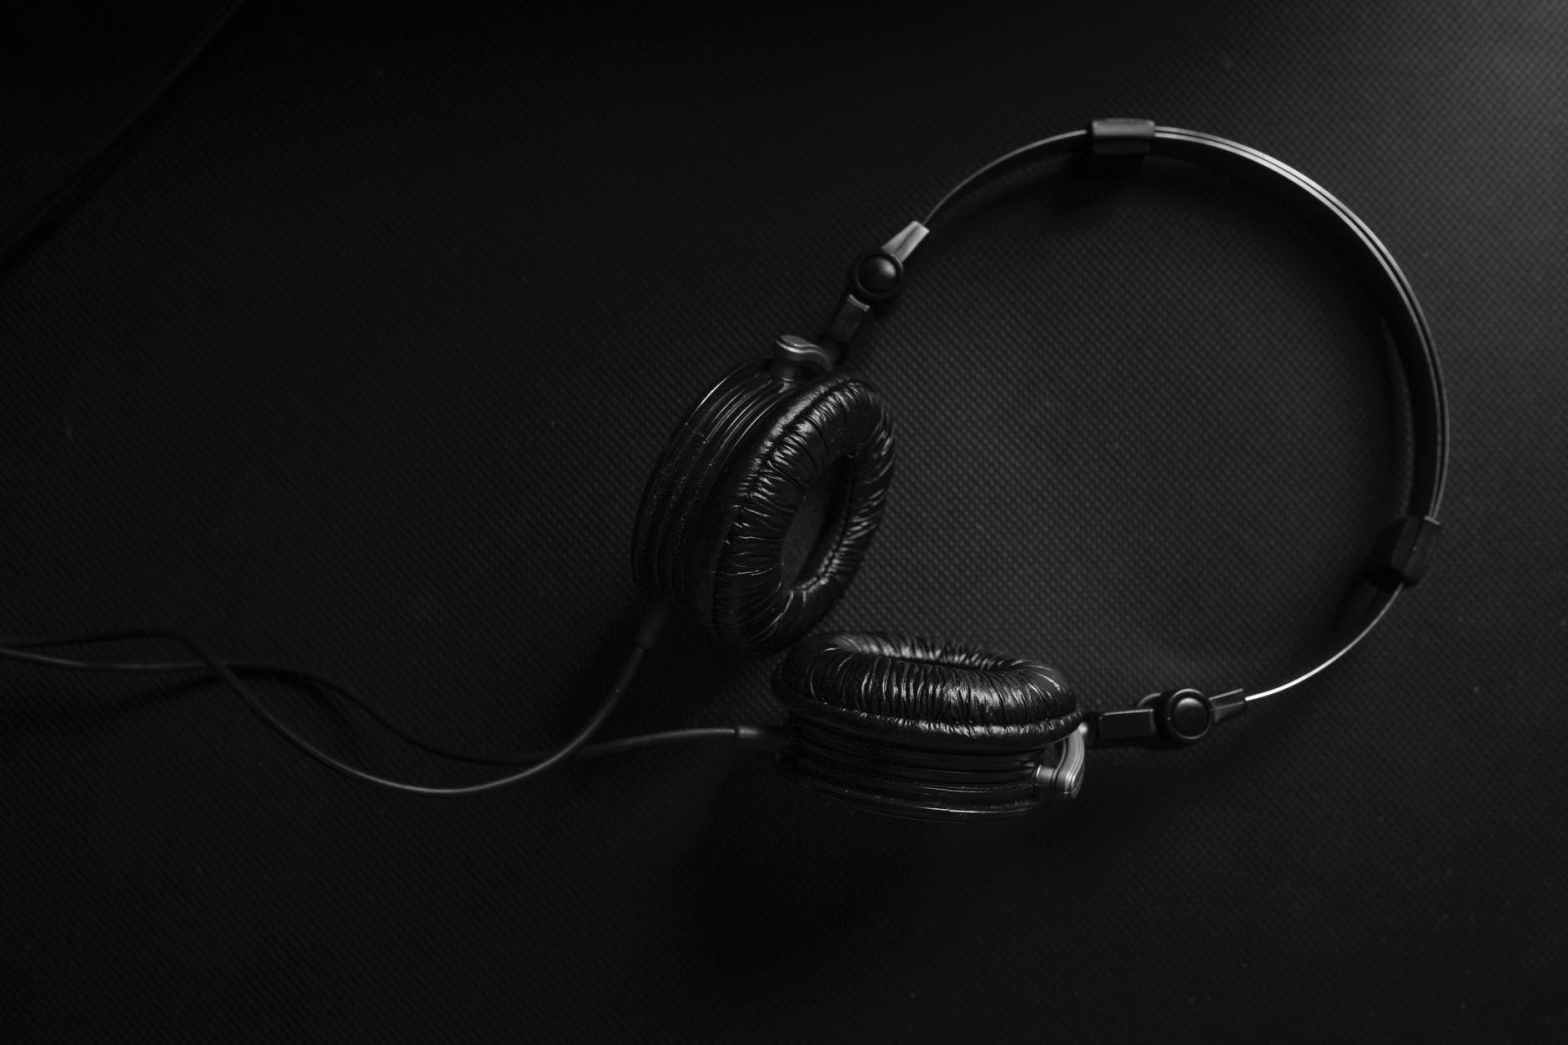 Black headphones on a black surface.